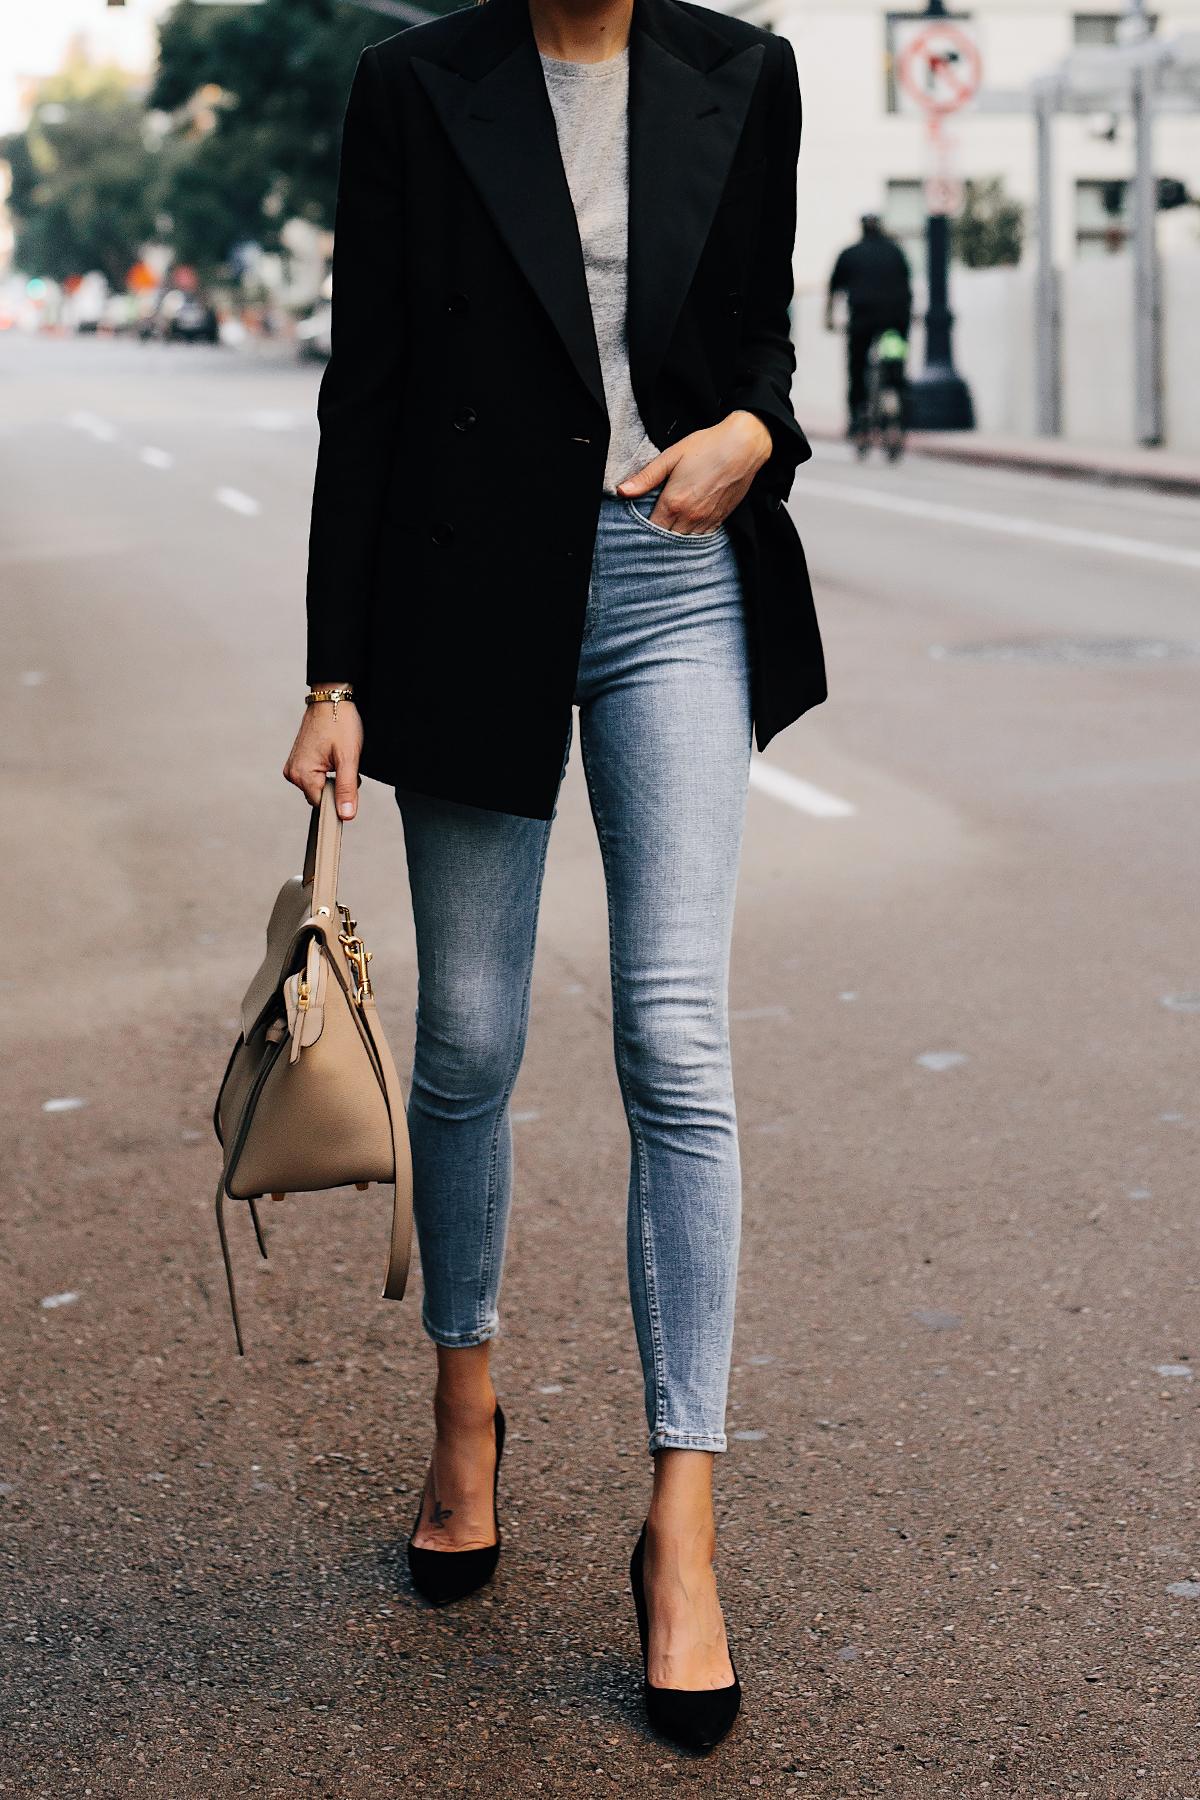 Woman Wearing Ralph Lauren Polo Black Blazer Grey Tshirt Denim Skinny Jeans Black Heels Outfit Fashion Jackson San Diego Fashion Blogger Street Style